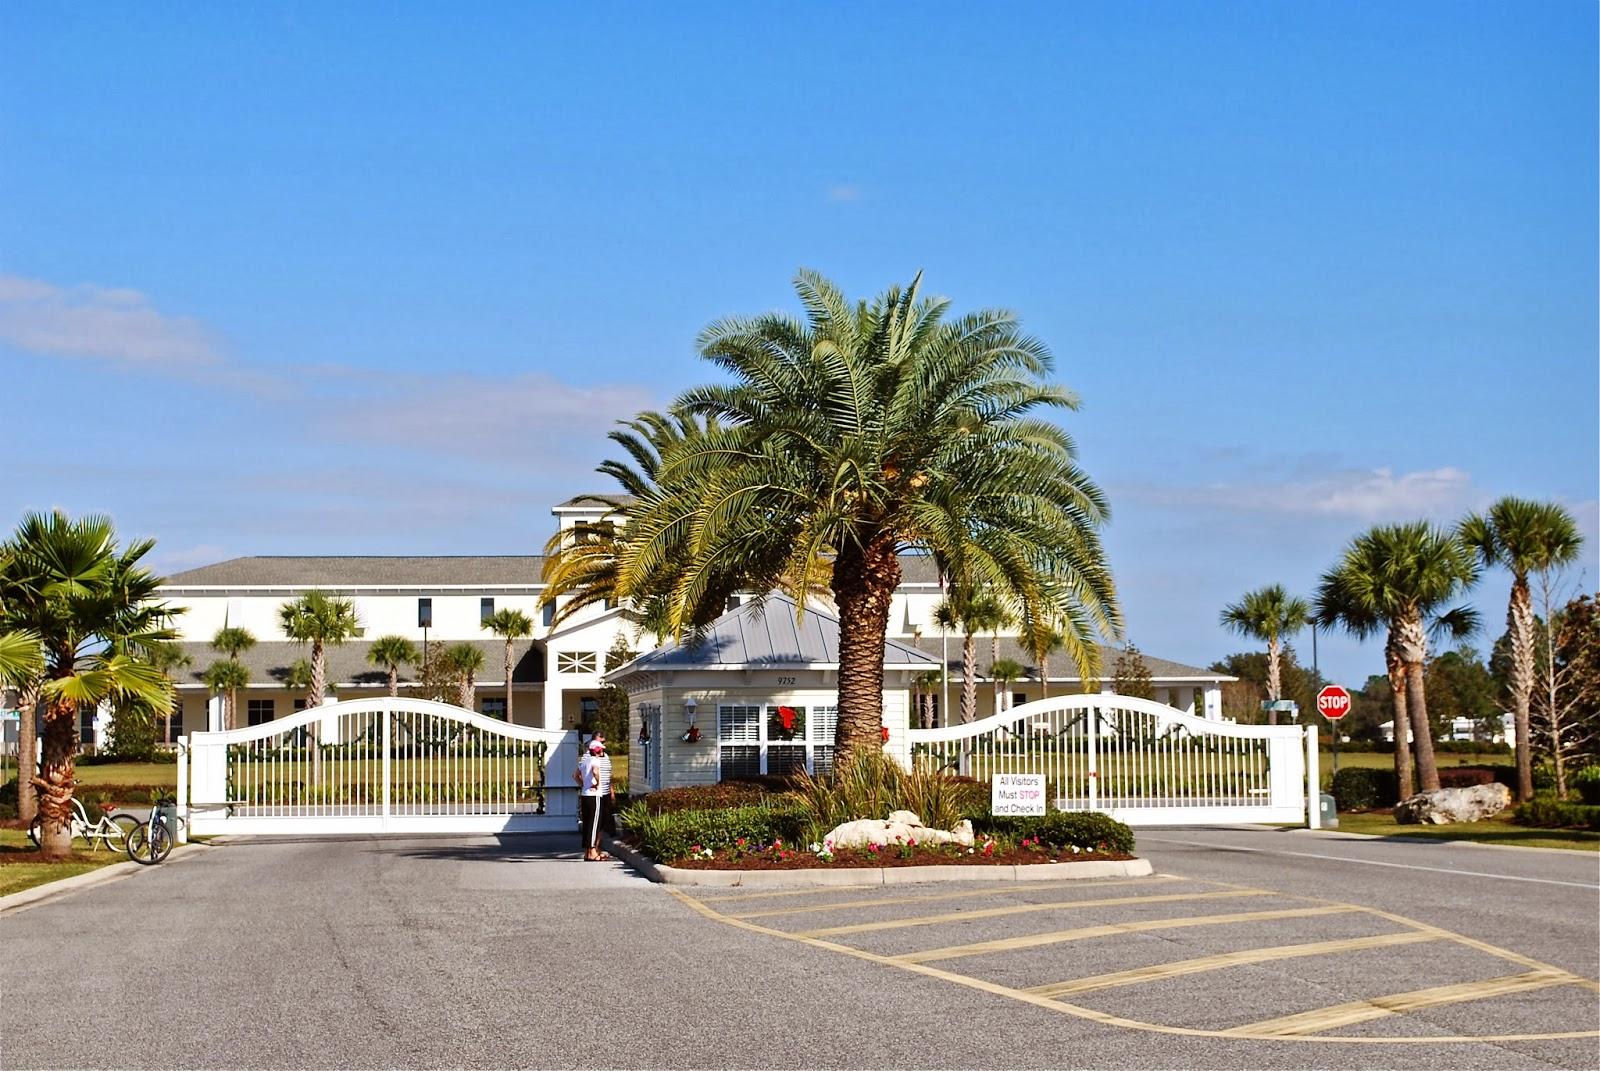 Blue sky ahead florida grande motor coach resort florida for Florida grande motor coach resort